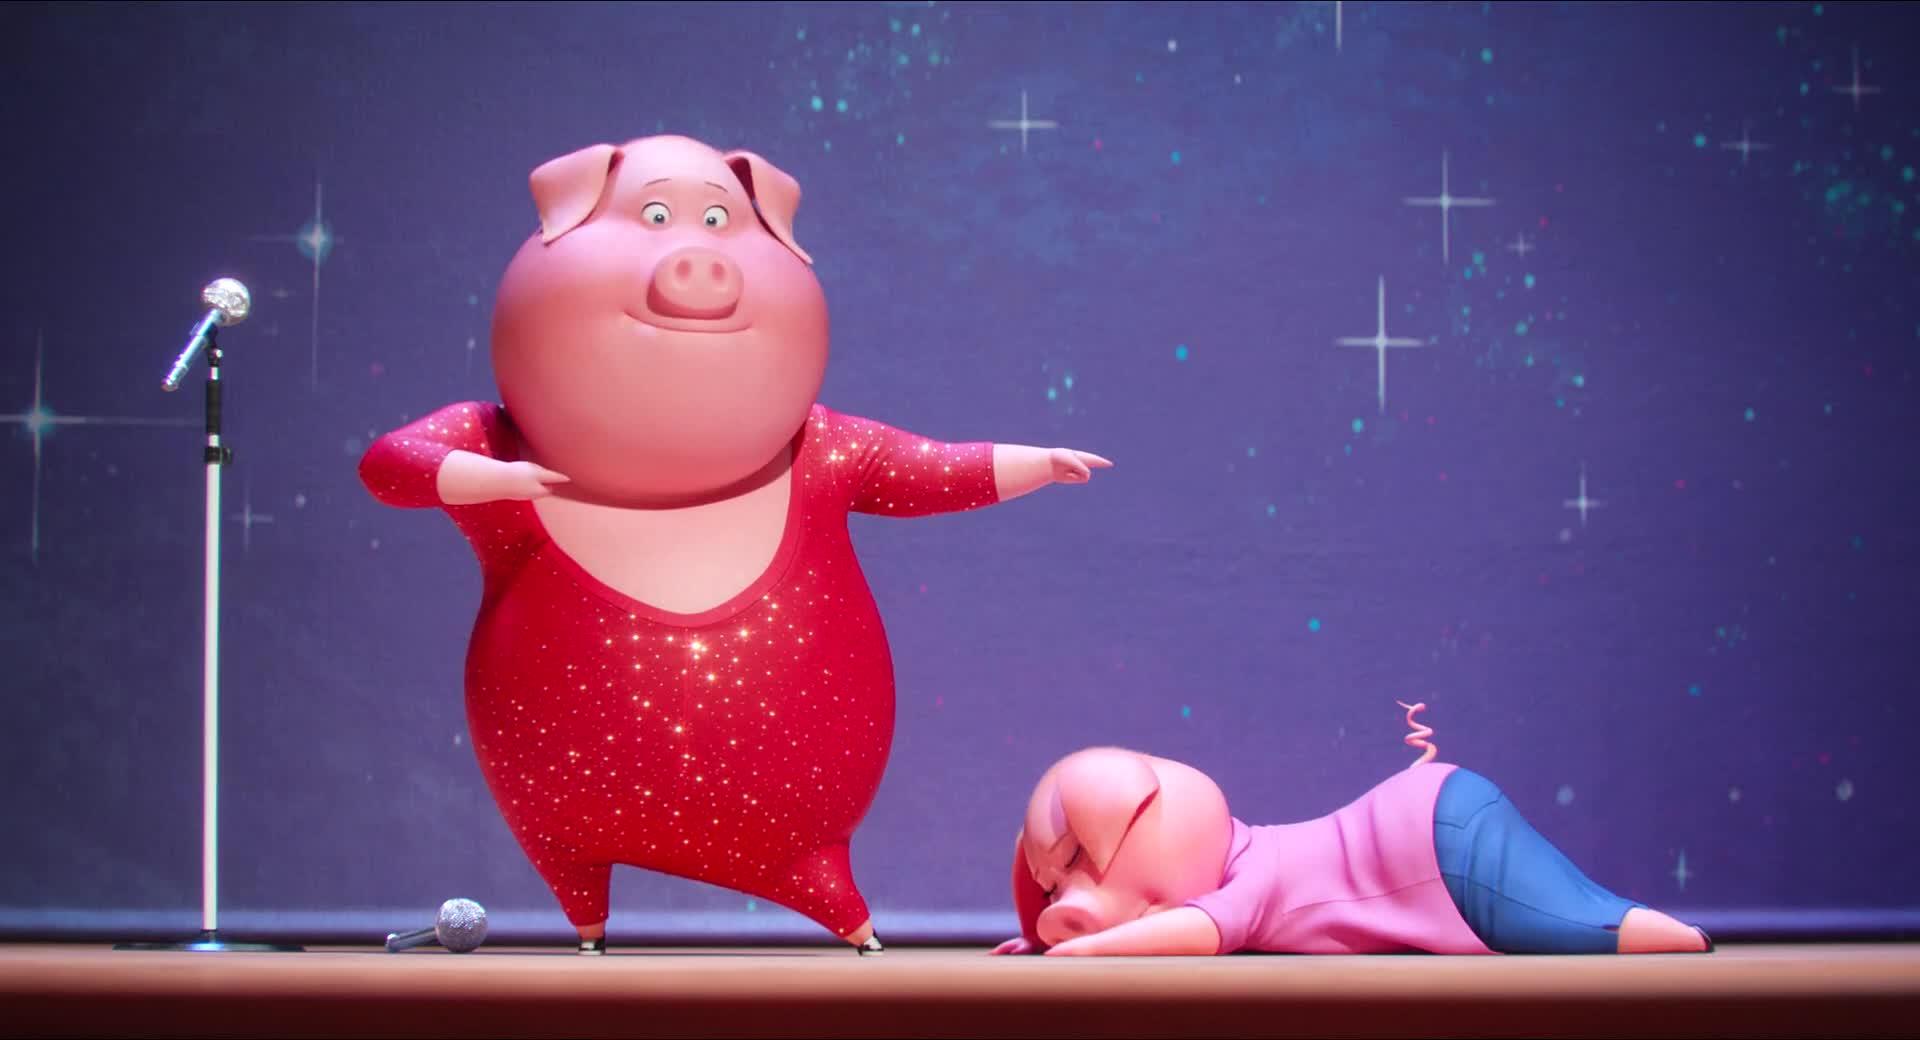 Zpivej Sing 2016 BluRay 1080p x264 AC3 2 0 CZ Dabing